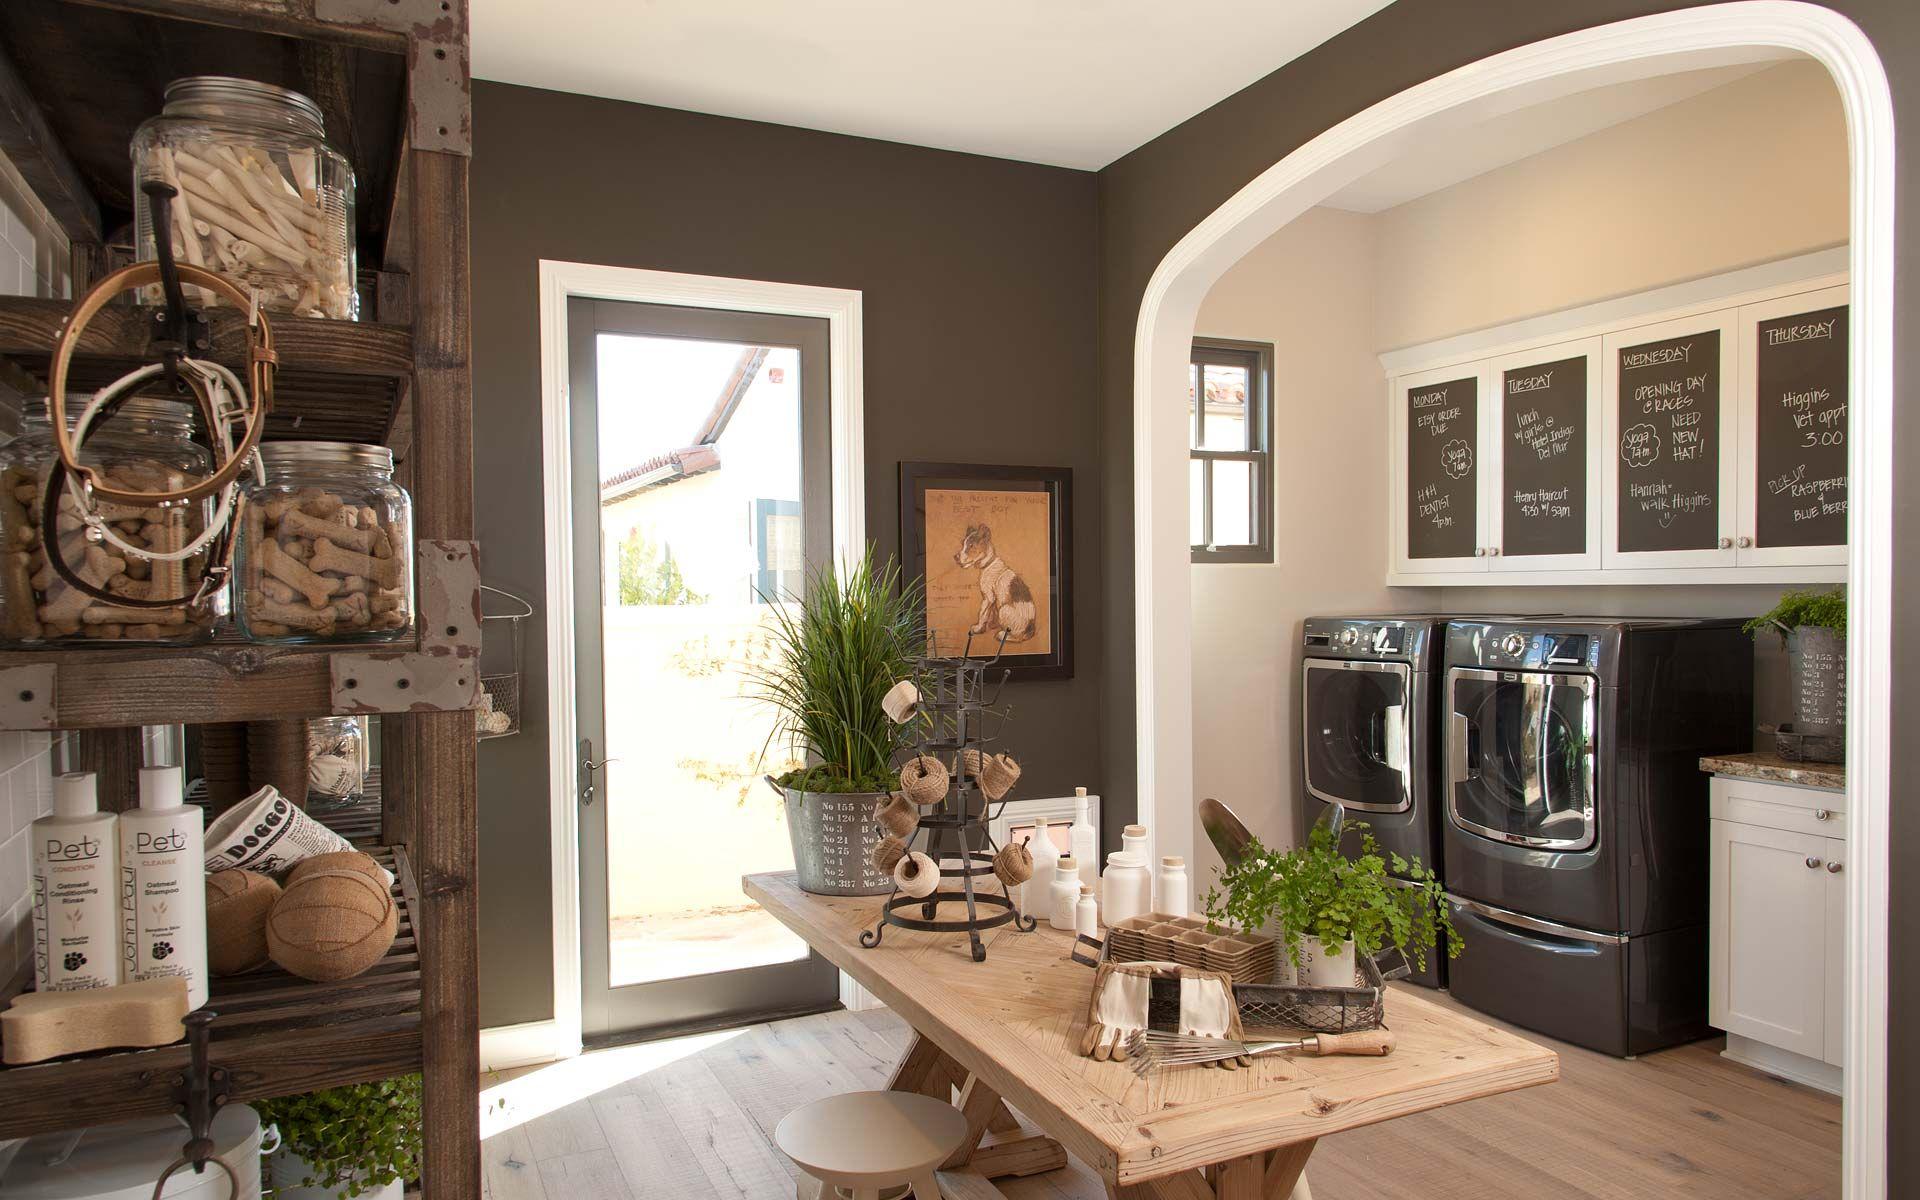 My dream home interior design arista at the crosby estates by davidson communities model home